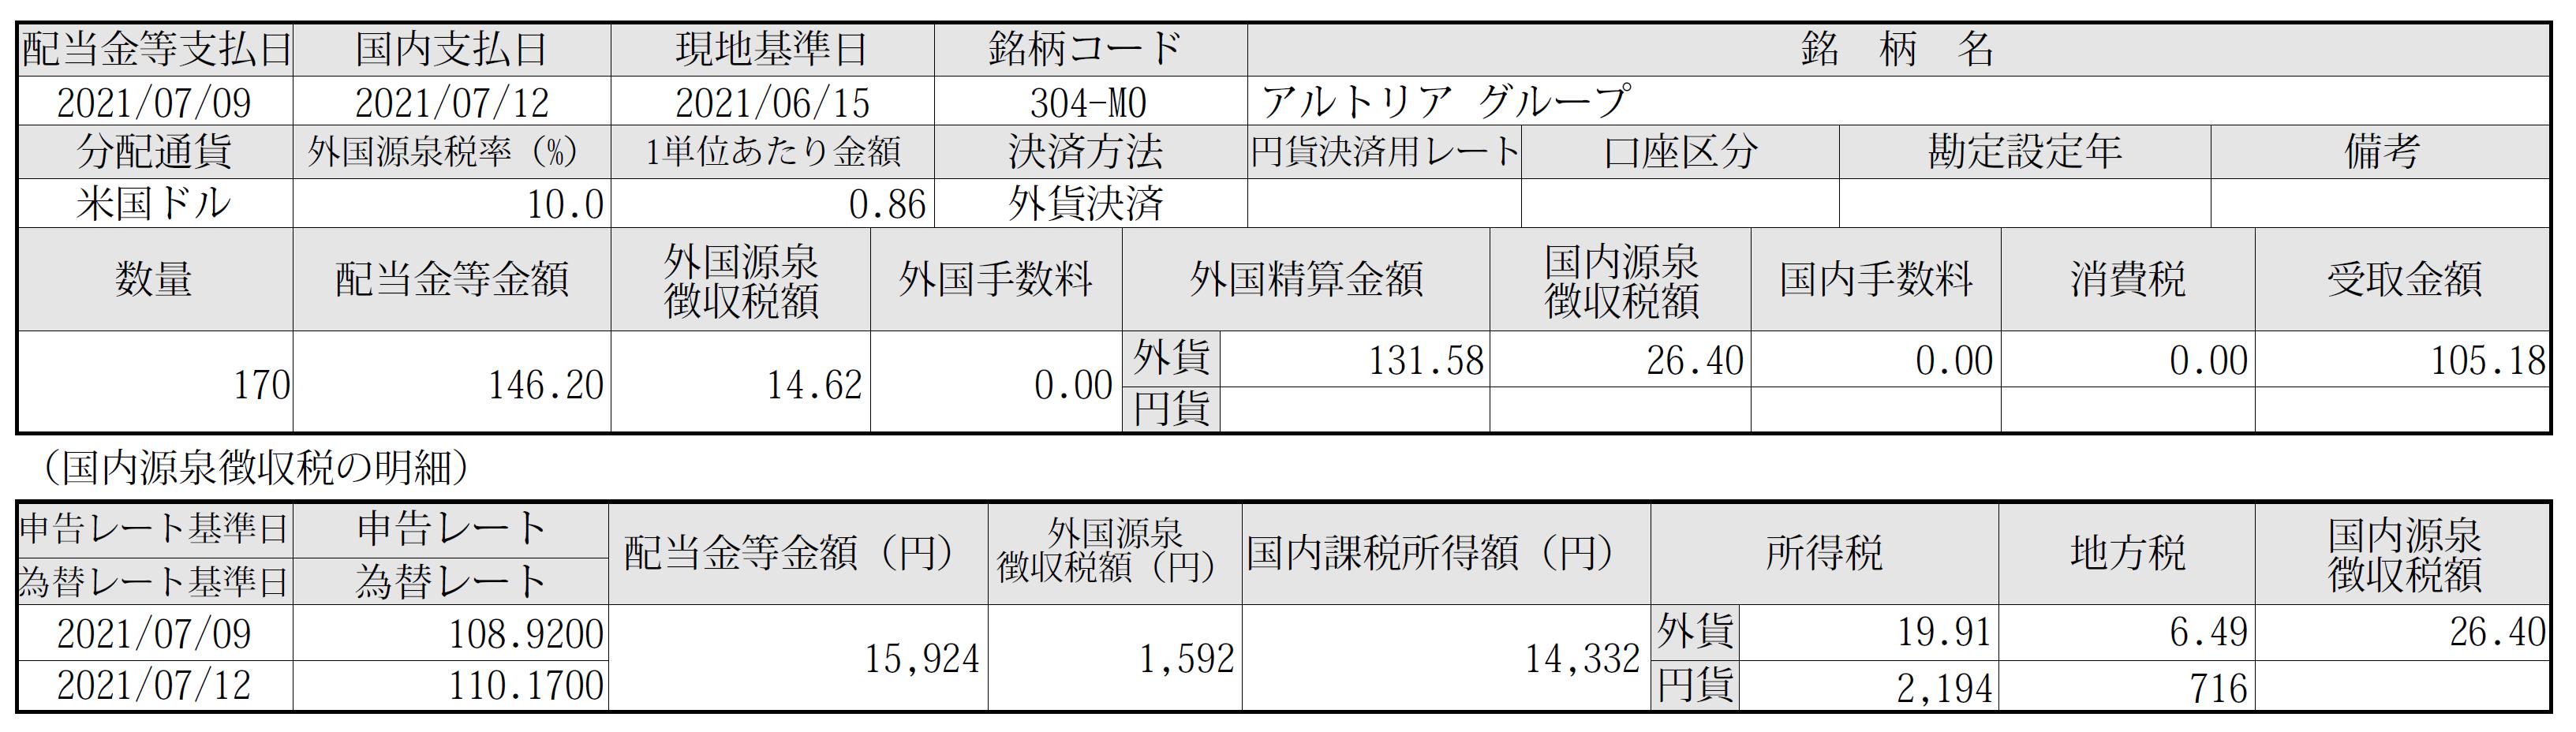 f:id:hodo-work:20210728114200p:plain